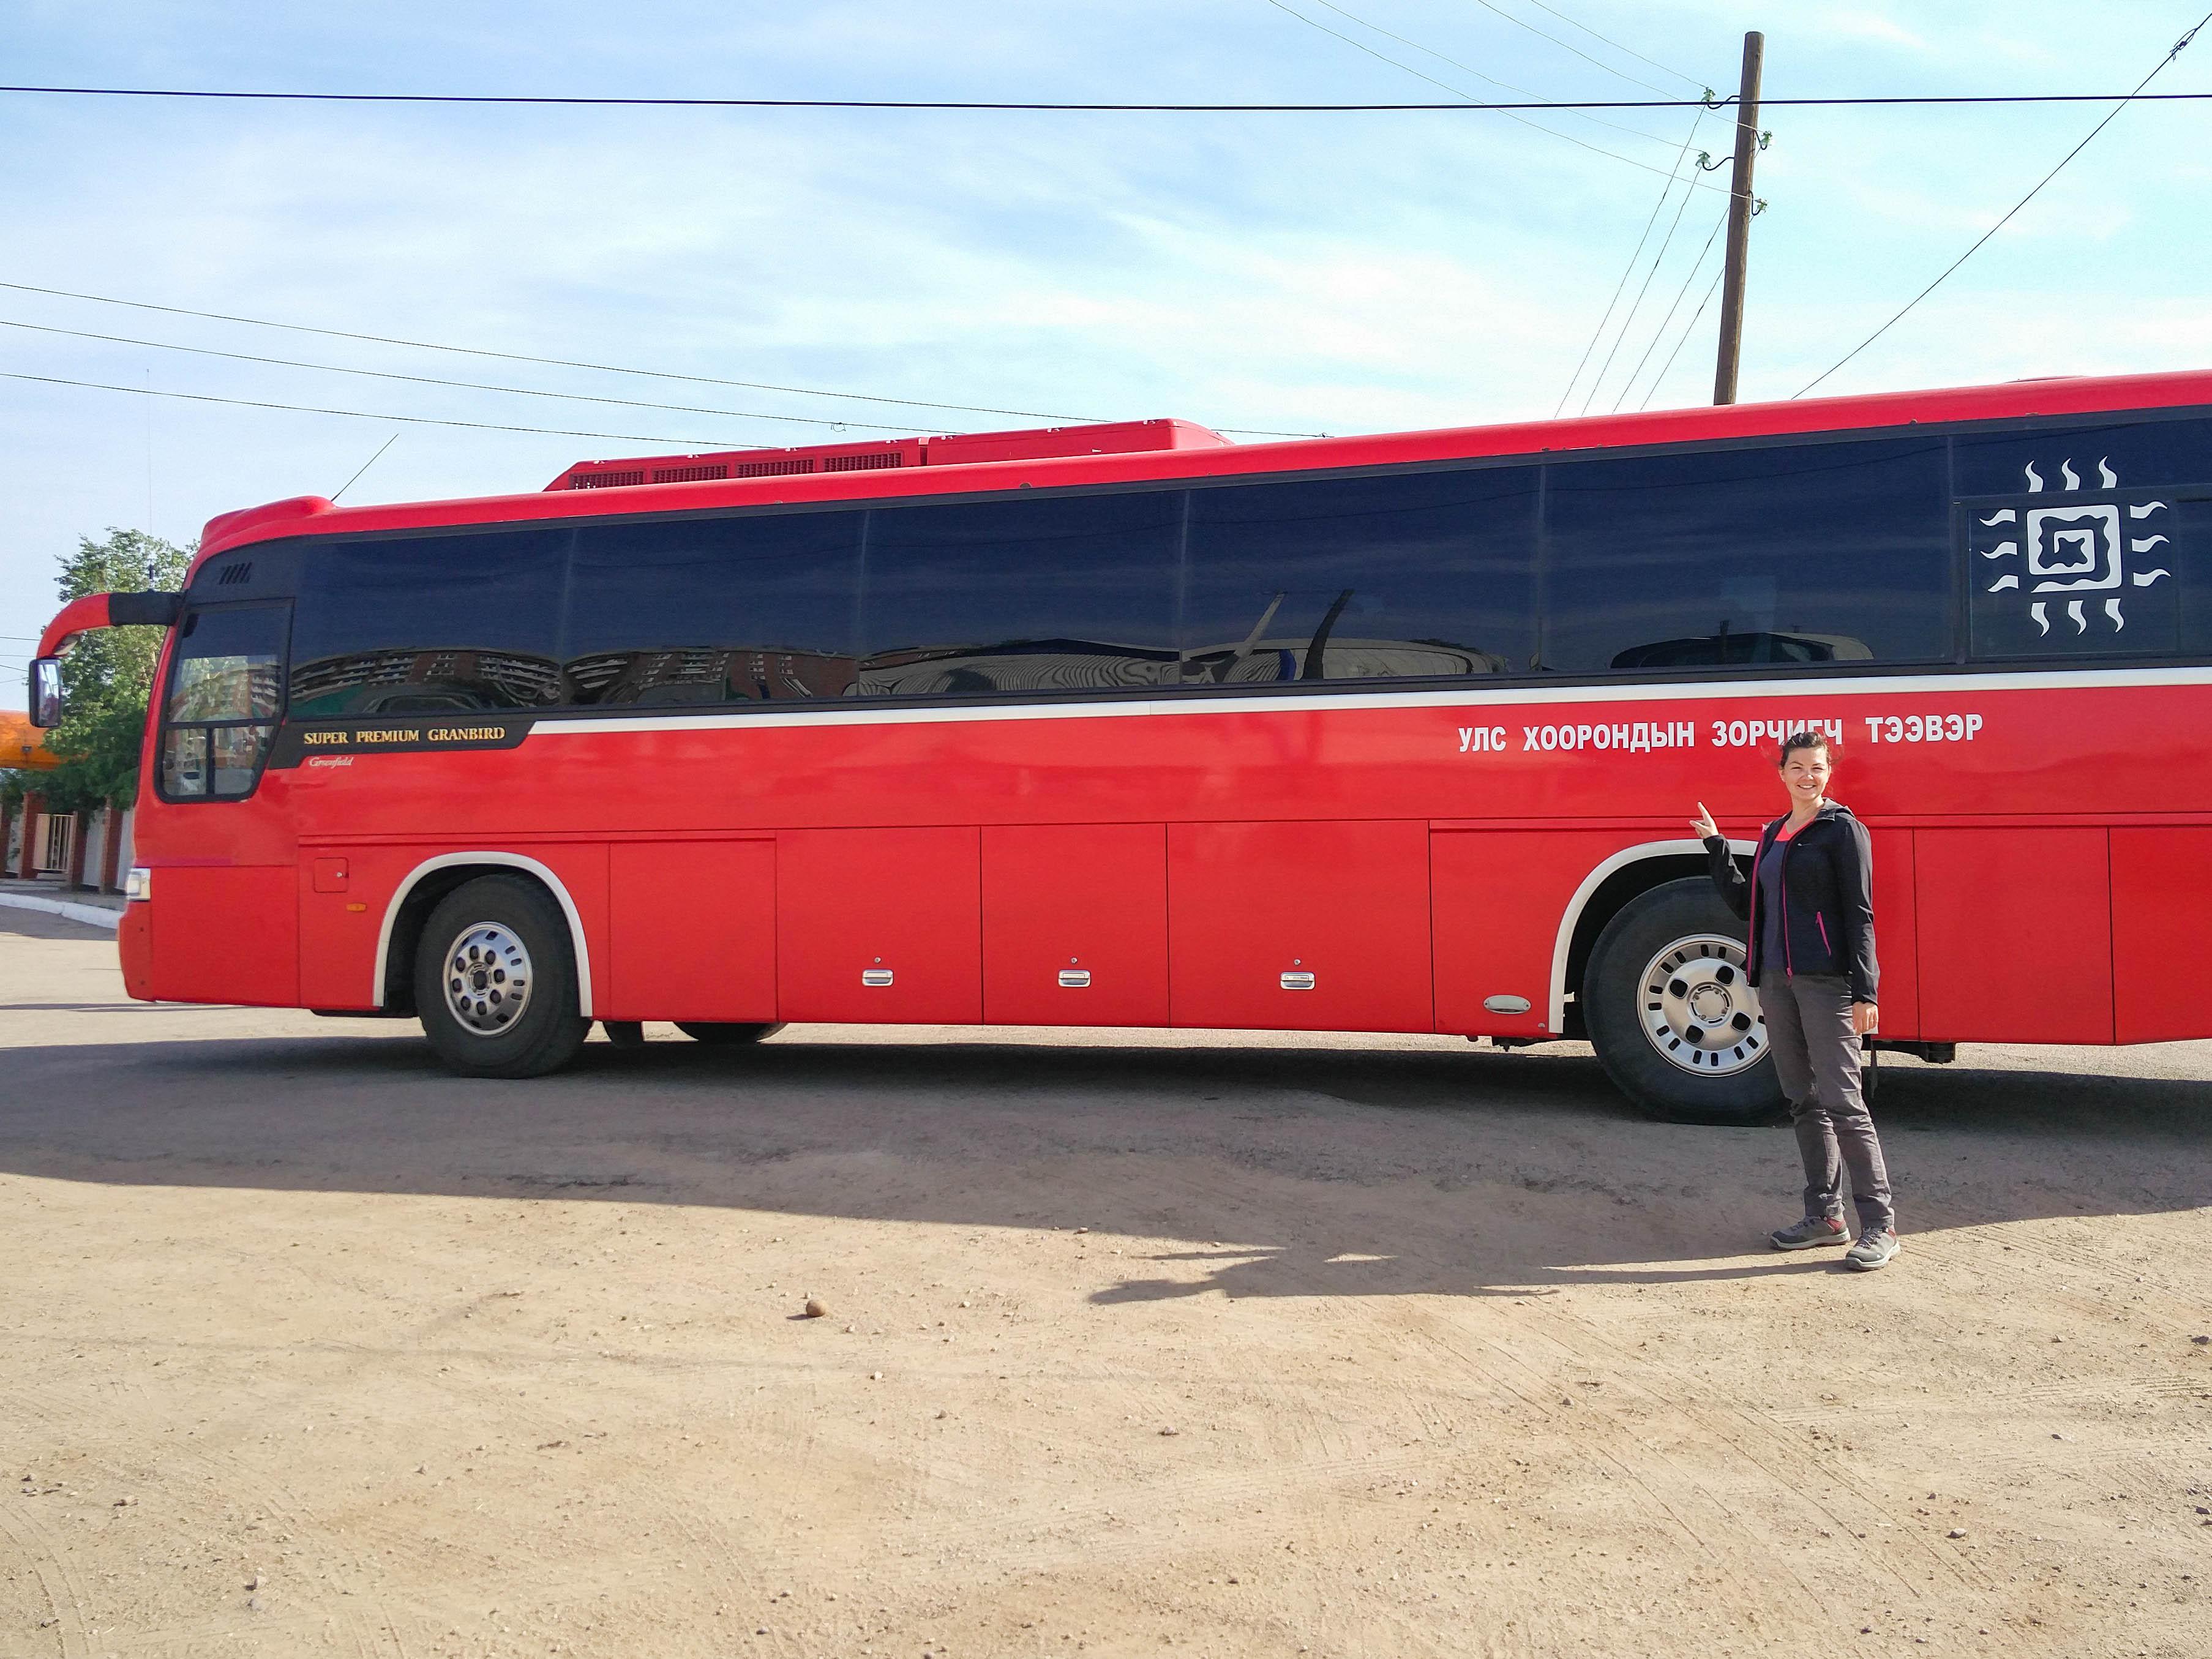 Trajet en bus d'Oulan Oudé à Oulan Bator en Mongolie @neweyes